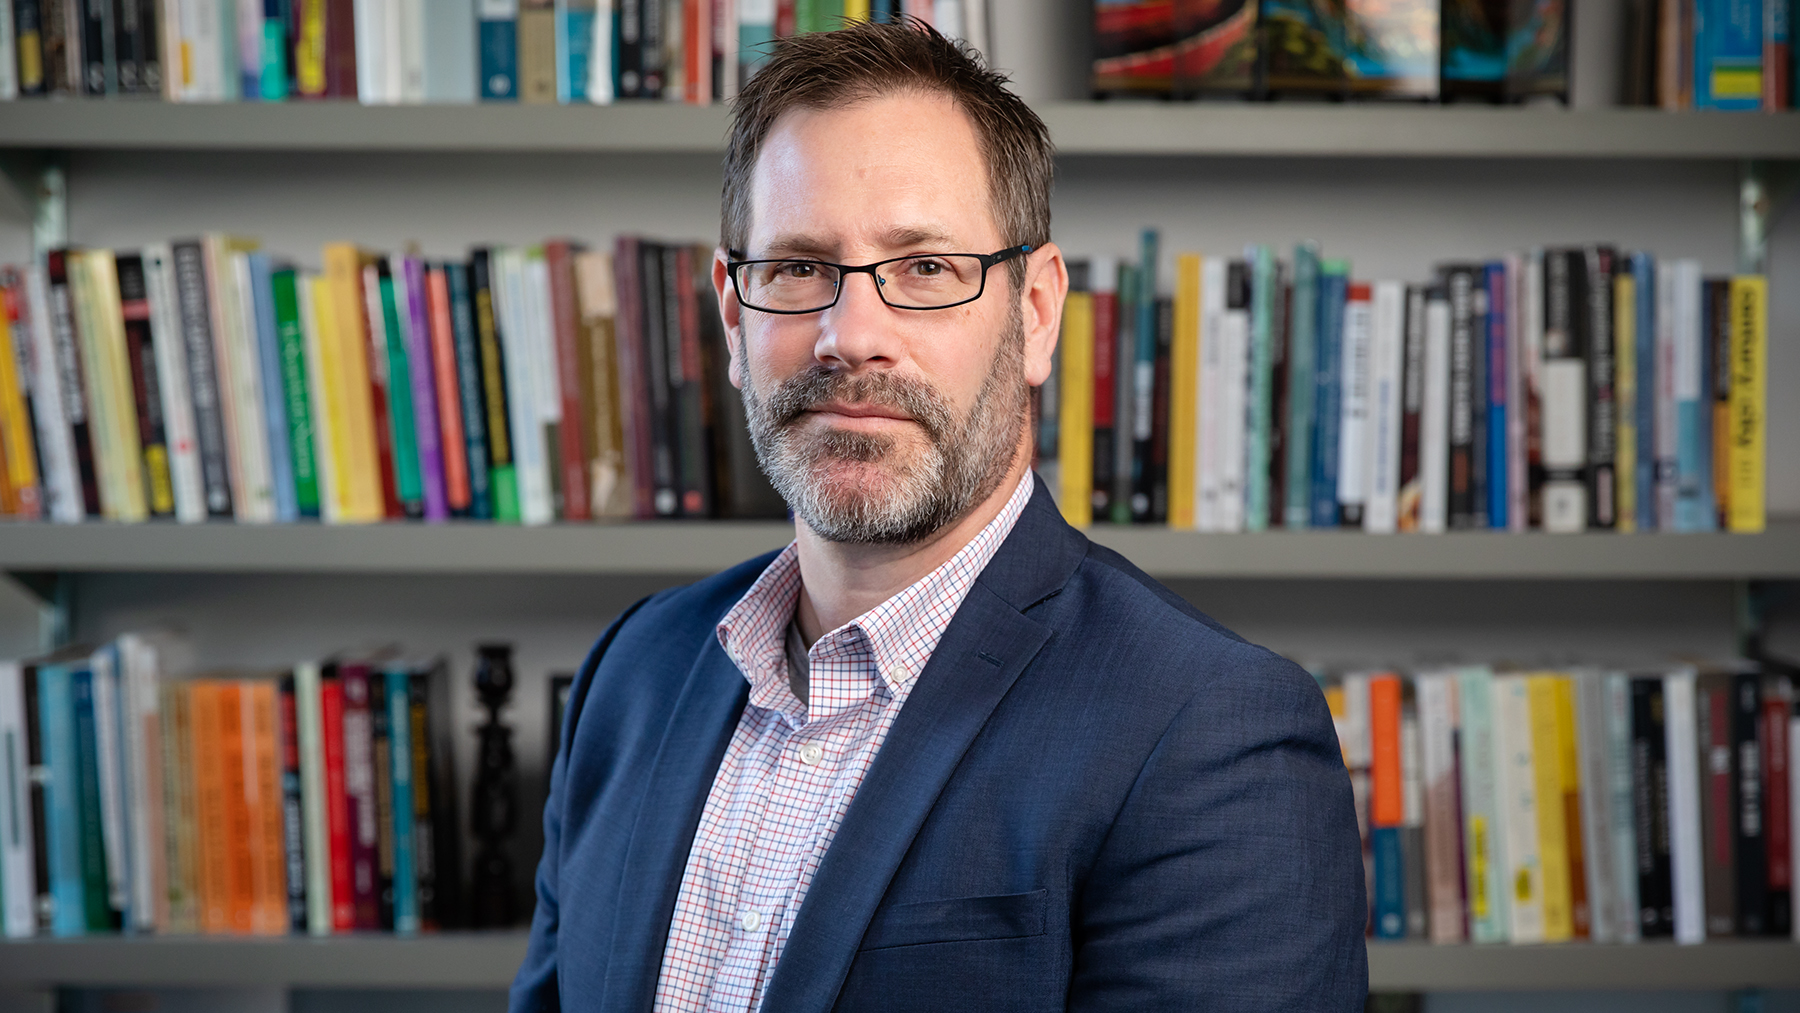 Sociology professor Brian Dill. Photo by L. Brian Stauffer